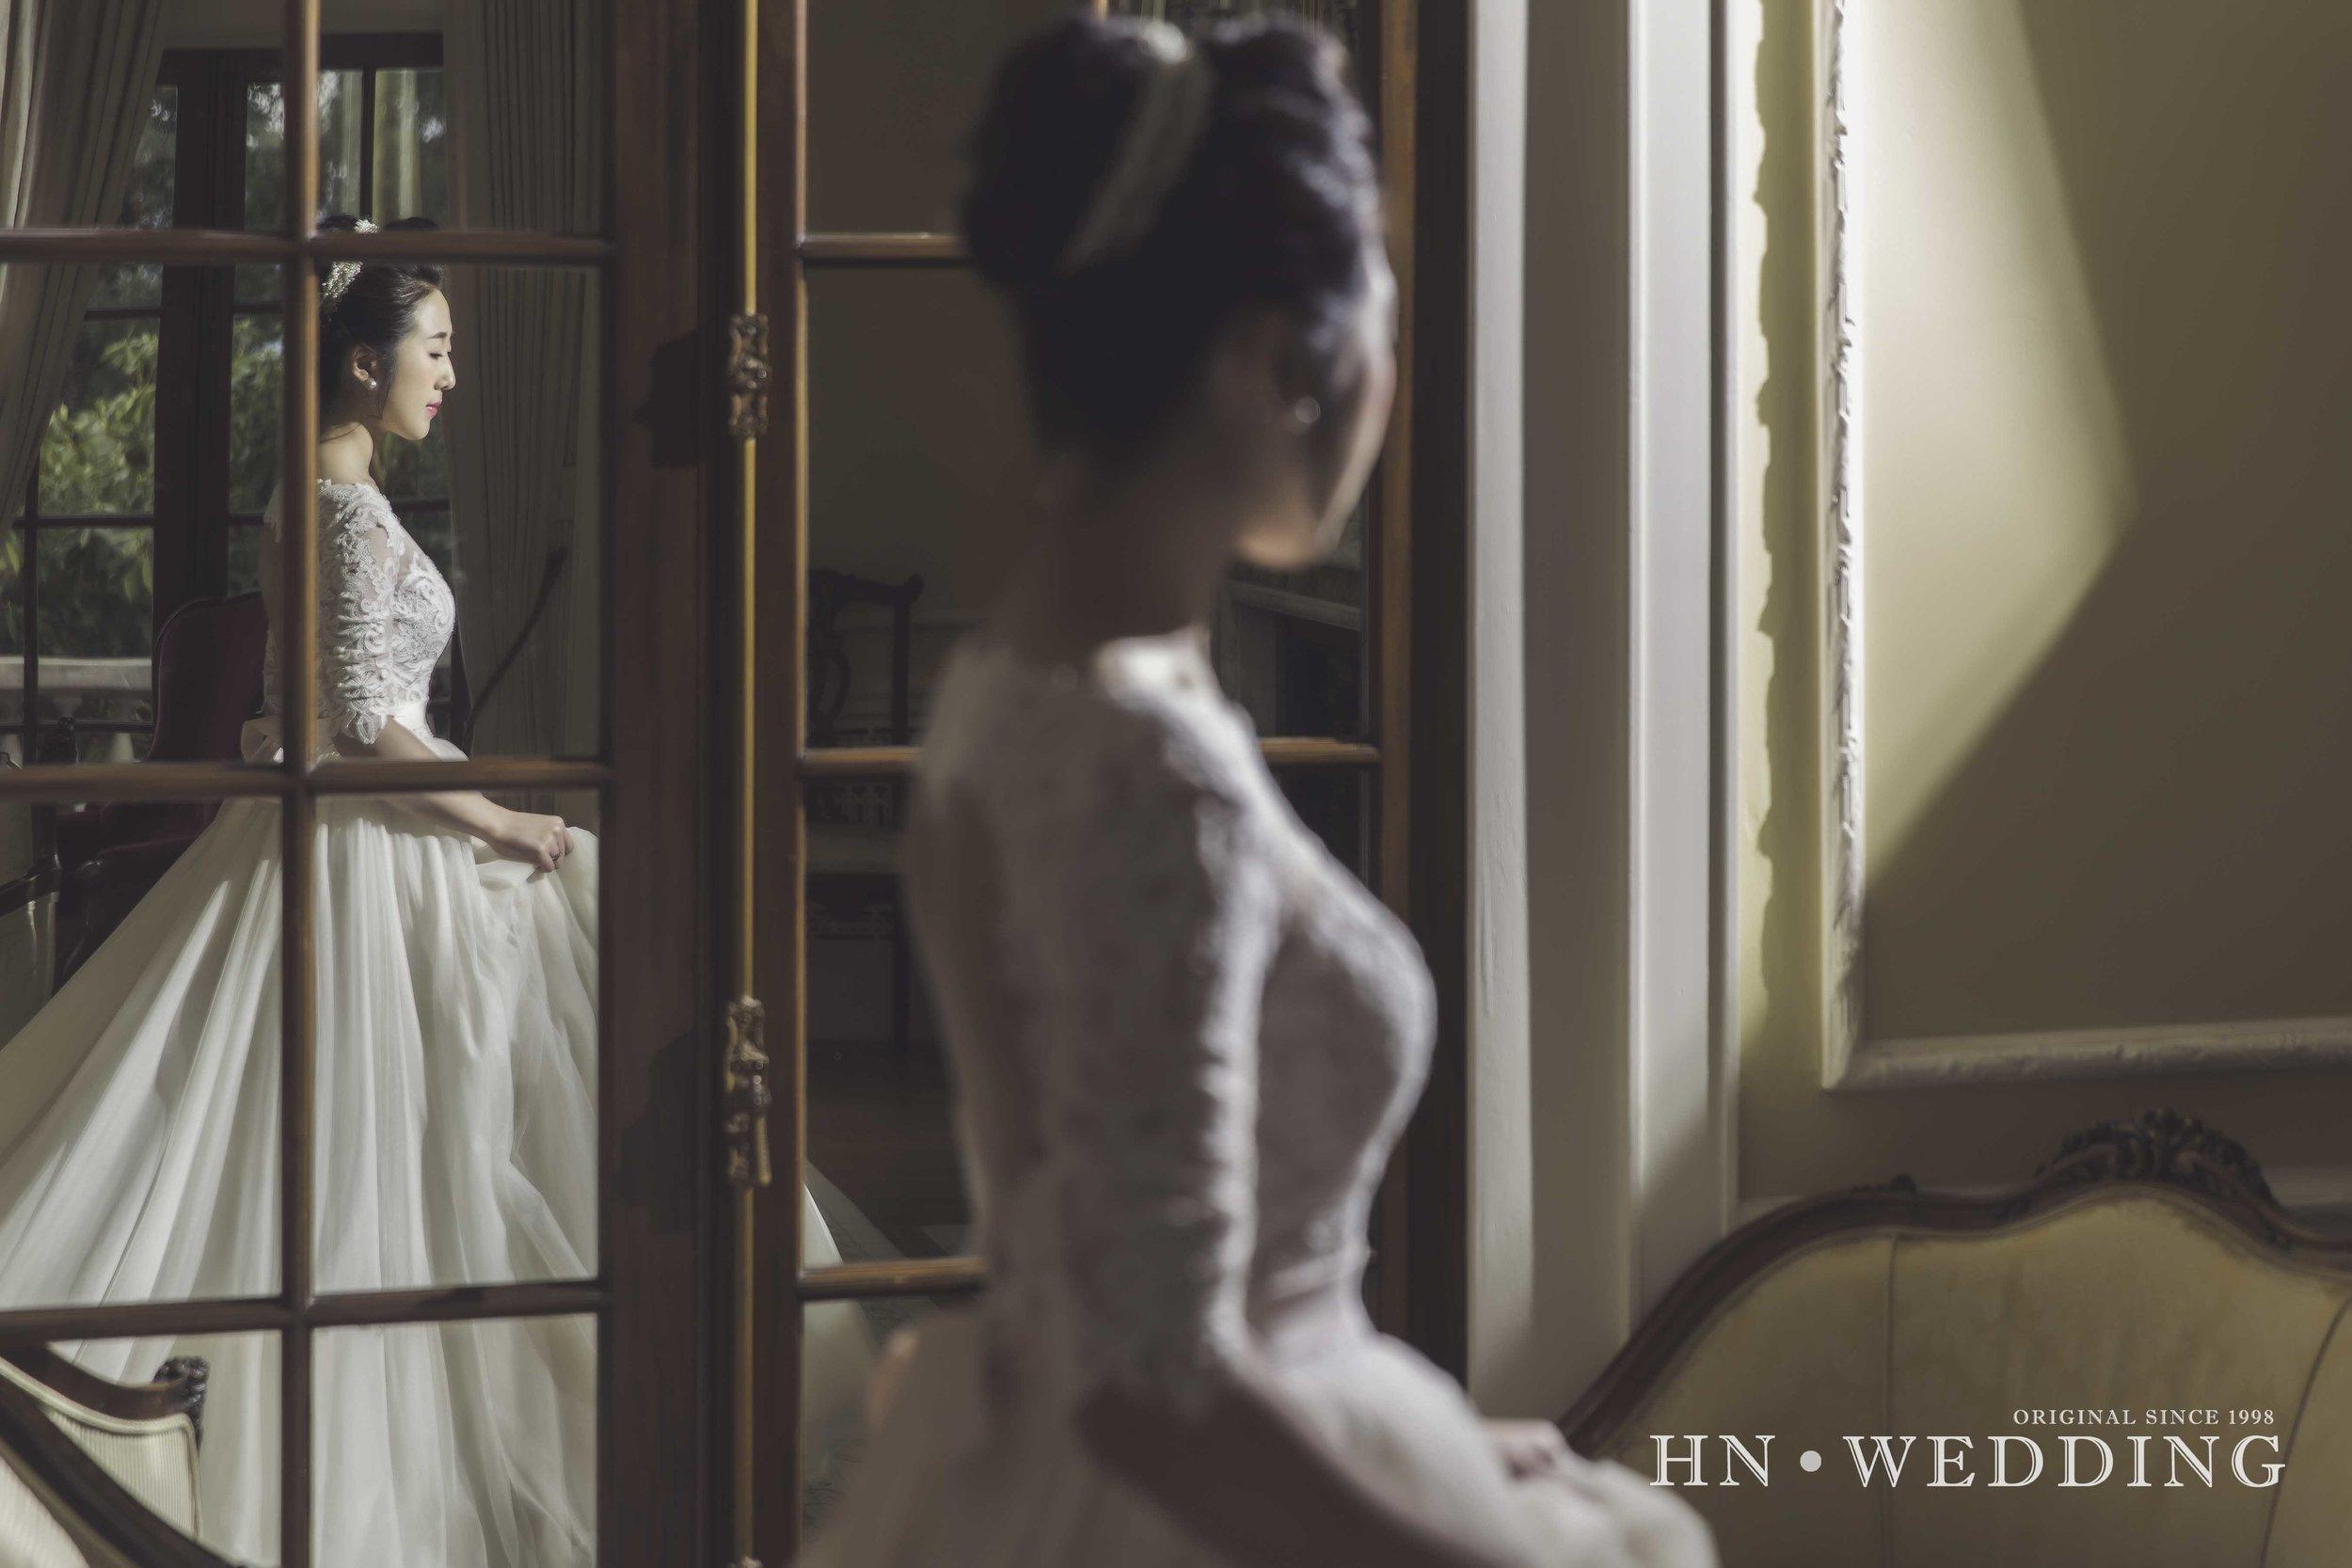 HNwedding-20170630-prewedding-5410.jpg